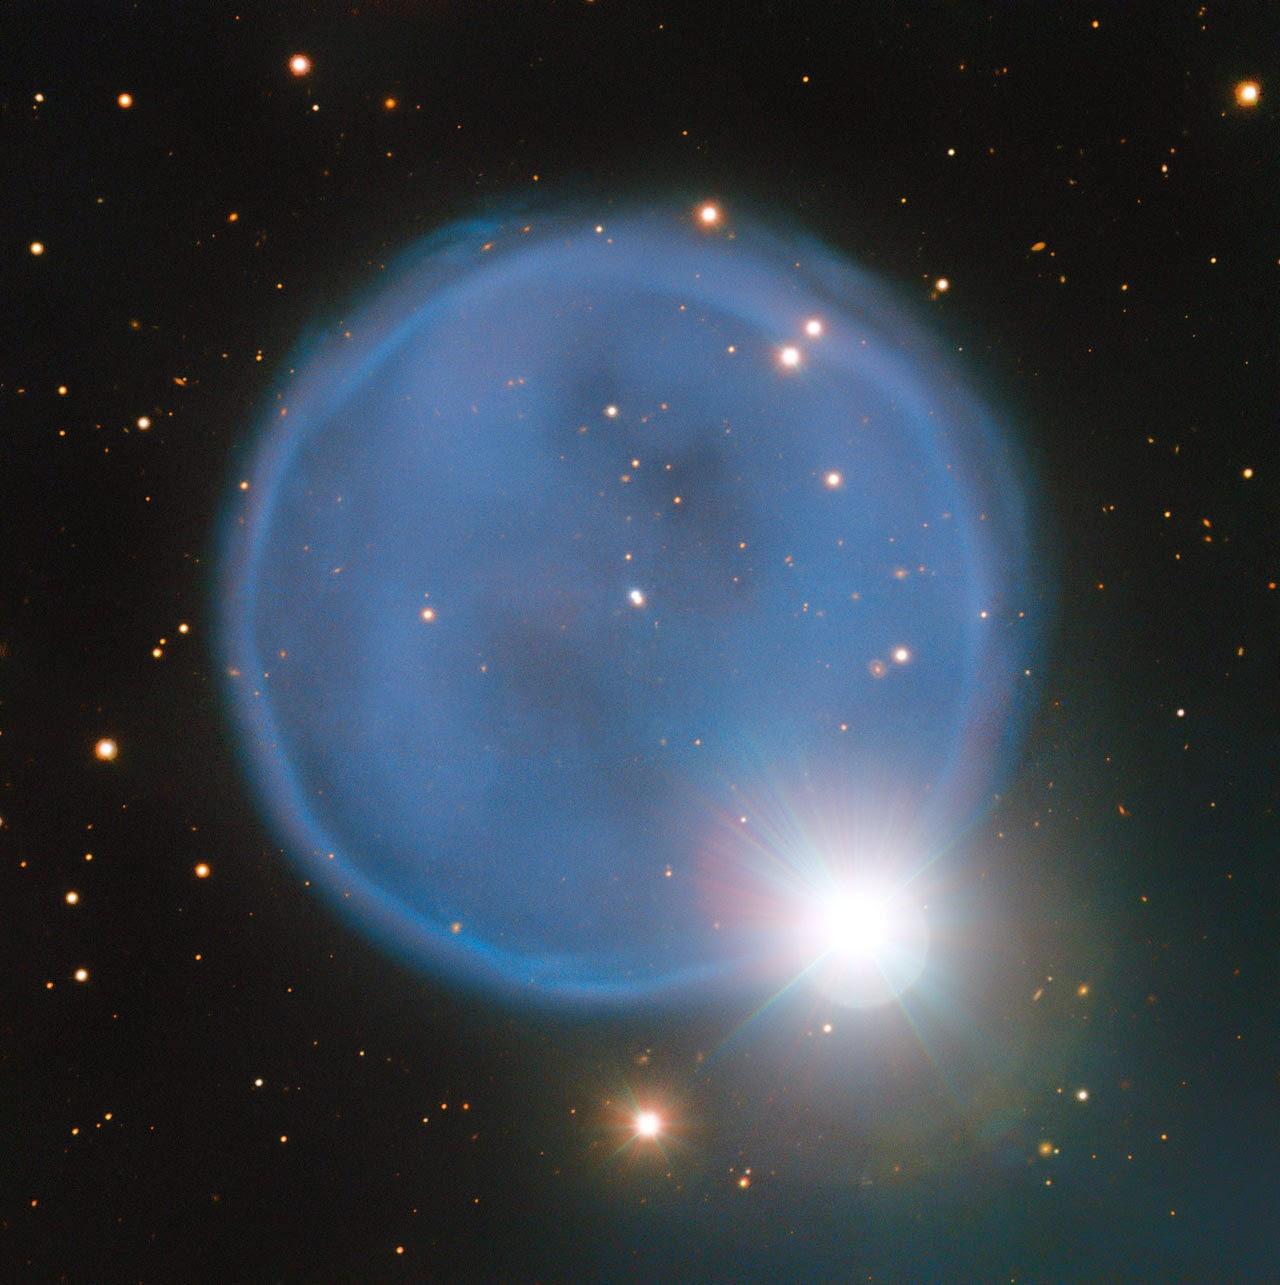 http://newswatch.nationalgeographic.com/2014/04/10/sea-serpent-eats-cosmic-diamond-ring/?utm_source=Facebook&utm_medium=Social&utm_content=link_fb20140411ngnw-seasert&utm_campaign=Content